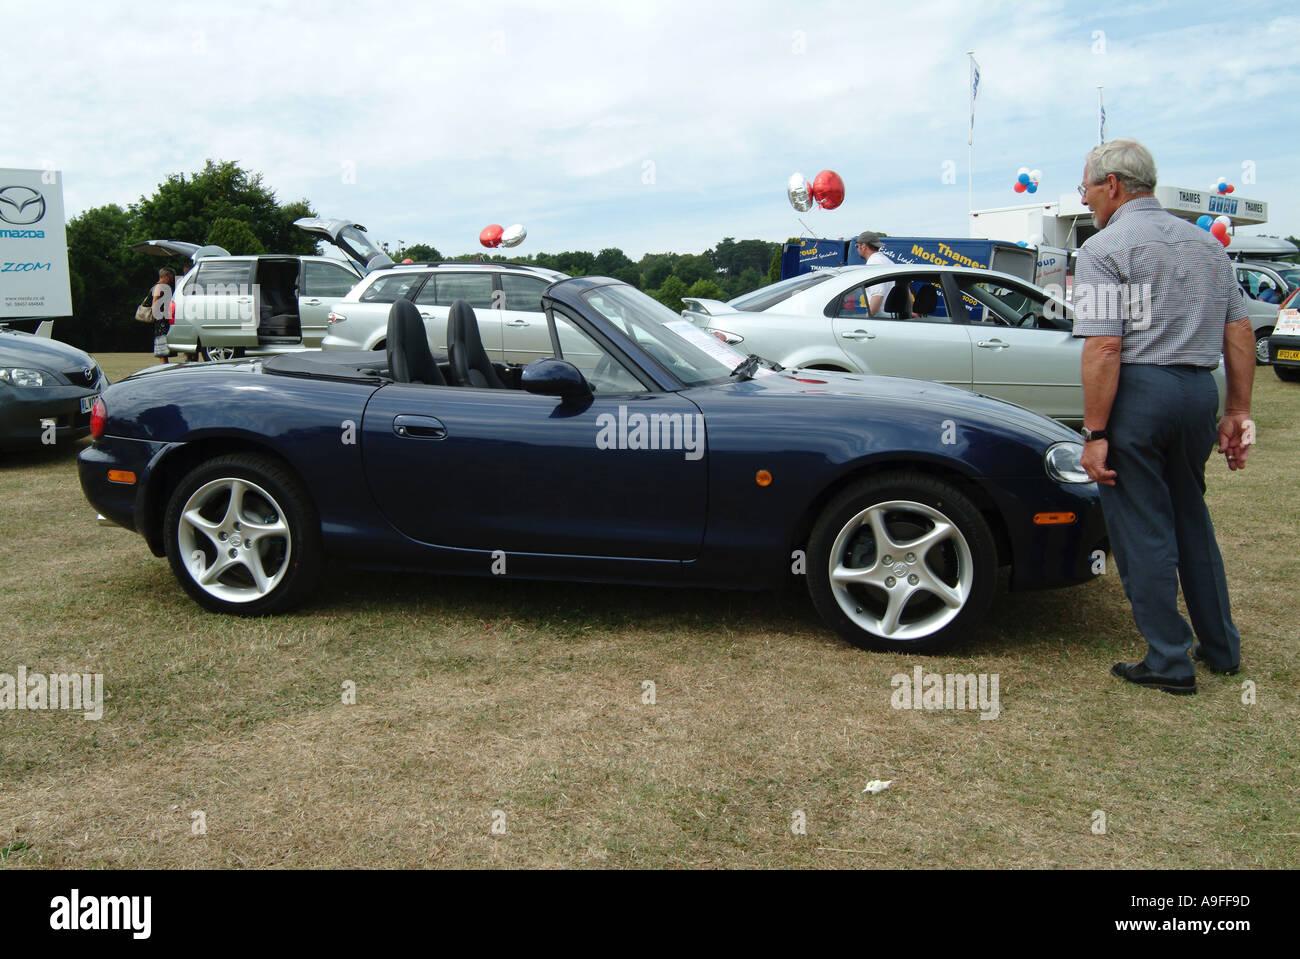 japan mazda mx5 convertable sports car New car Finance dealer show ...